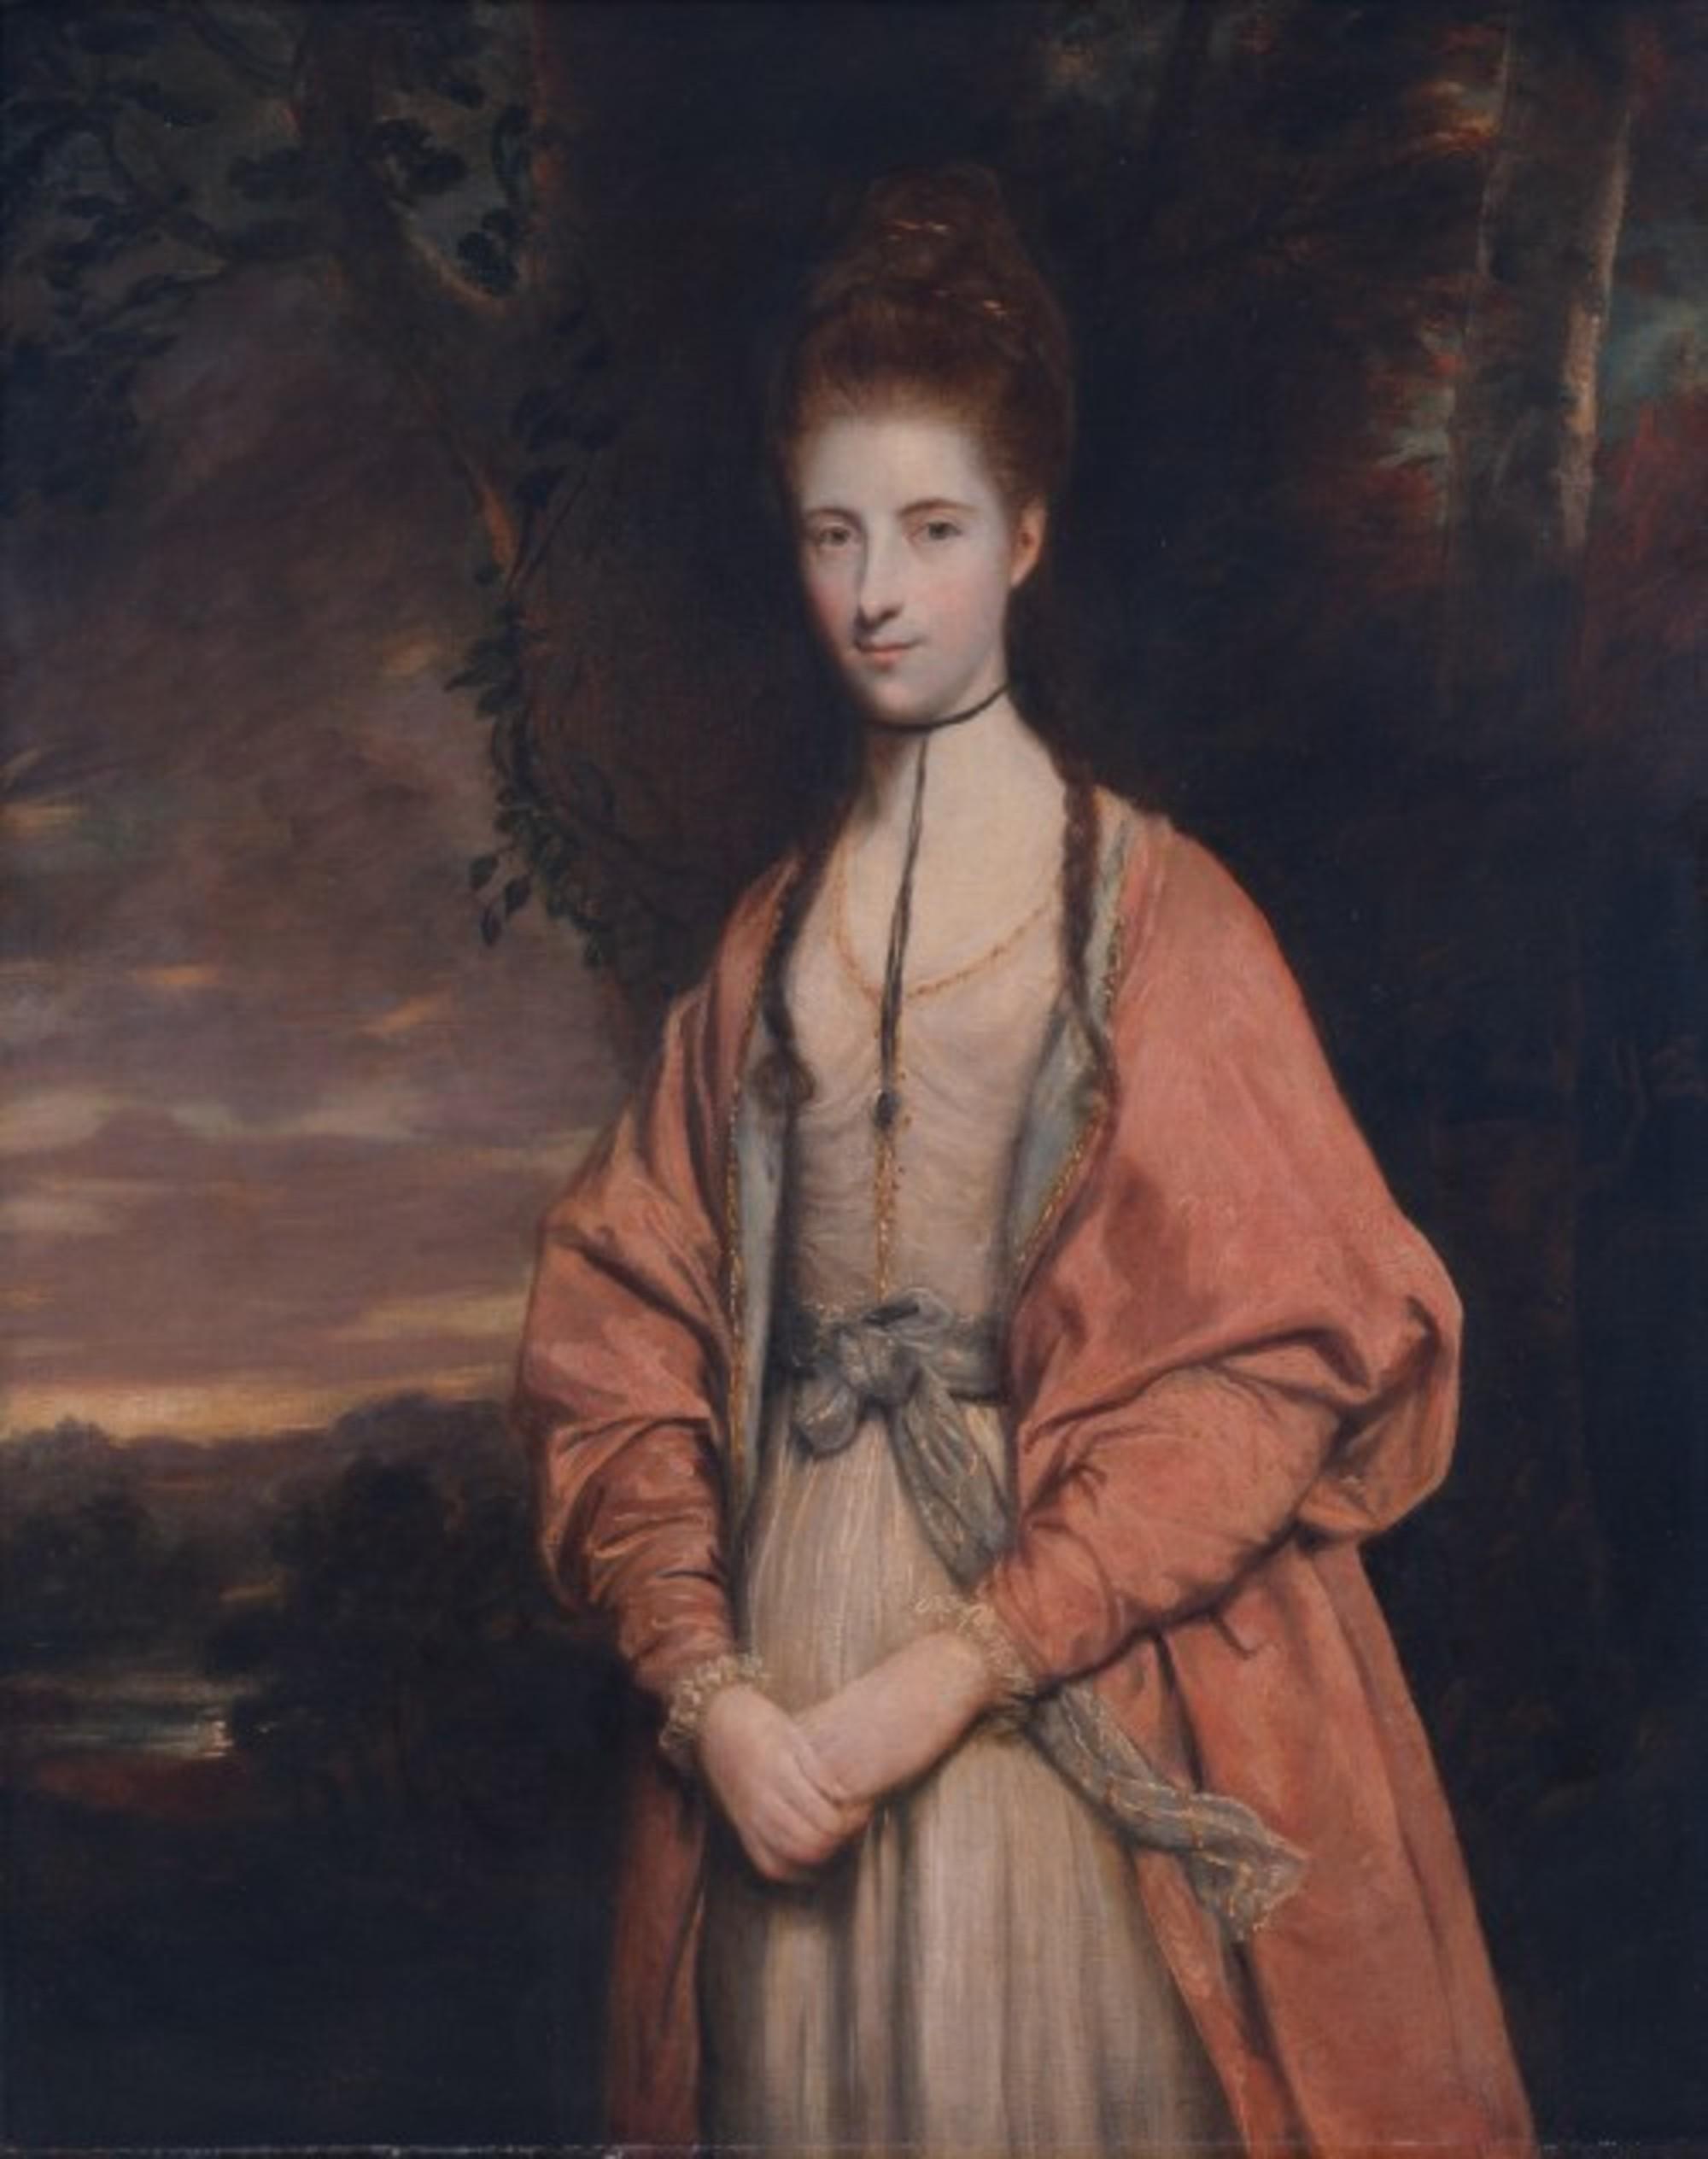 Anne_Seymour_Damer_by_Joshua_Reynolds_1723-1792.jpg